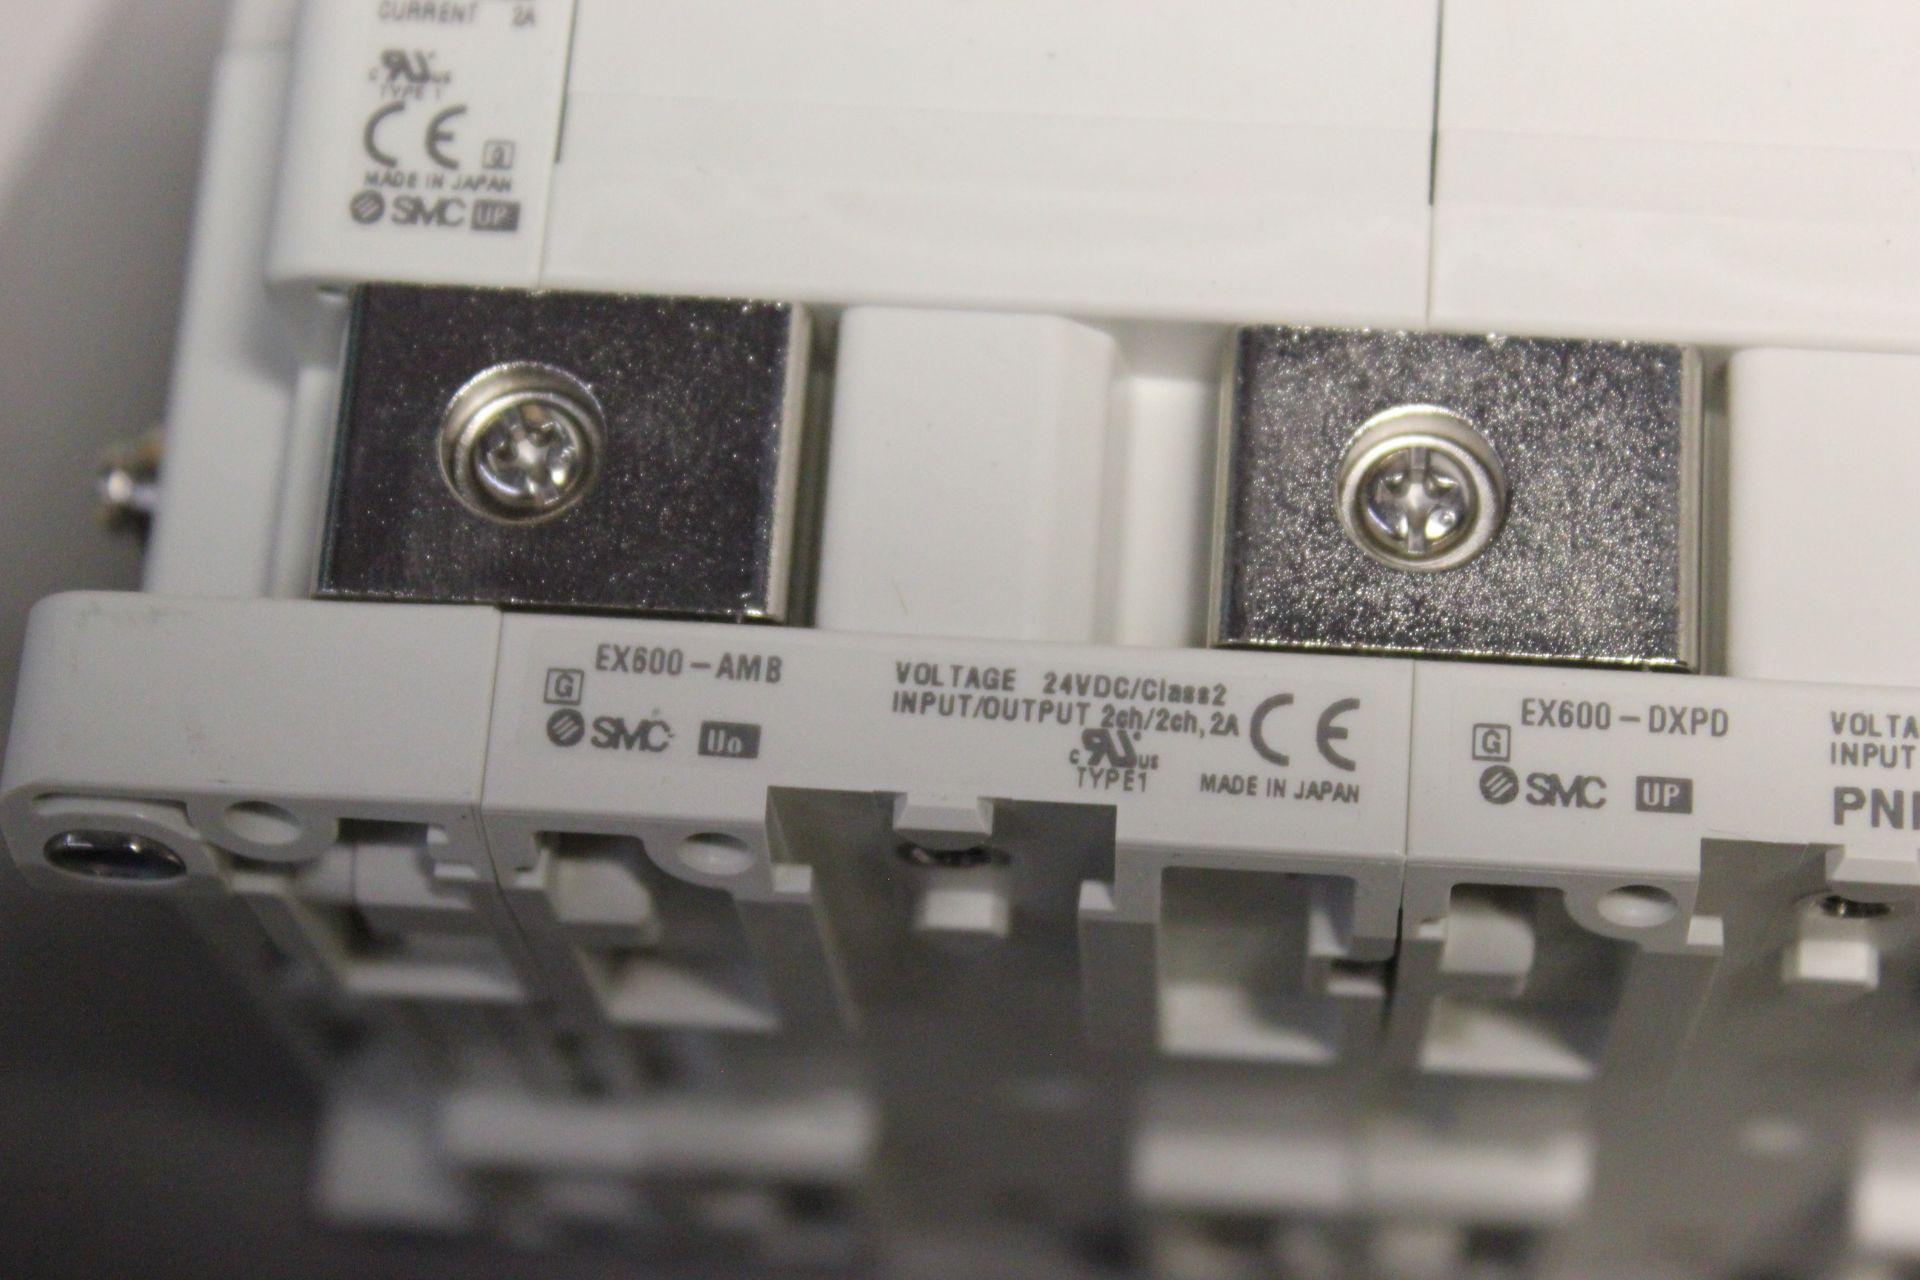 NEW SMC MANIFOLD WITH SOLENOID VALVES, ETHERNET/IP I/O - Image 6 of 8